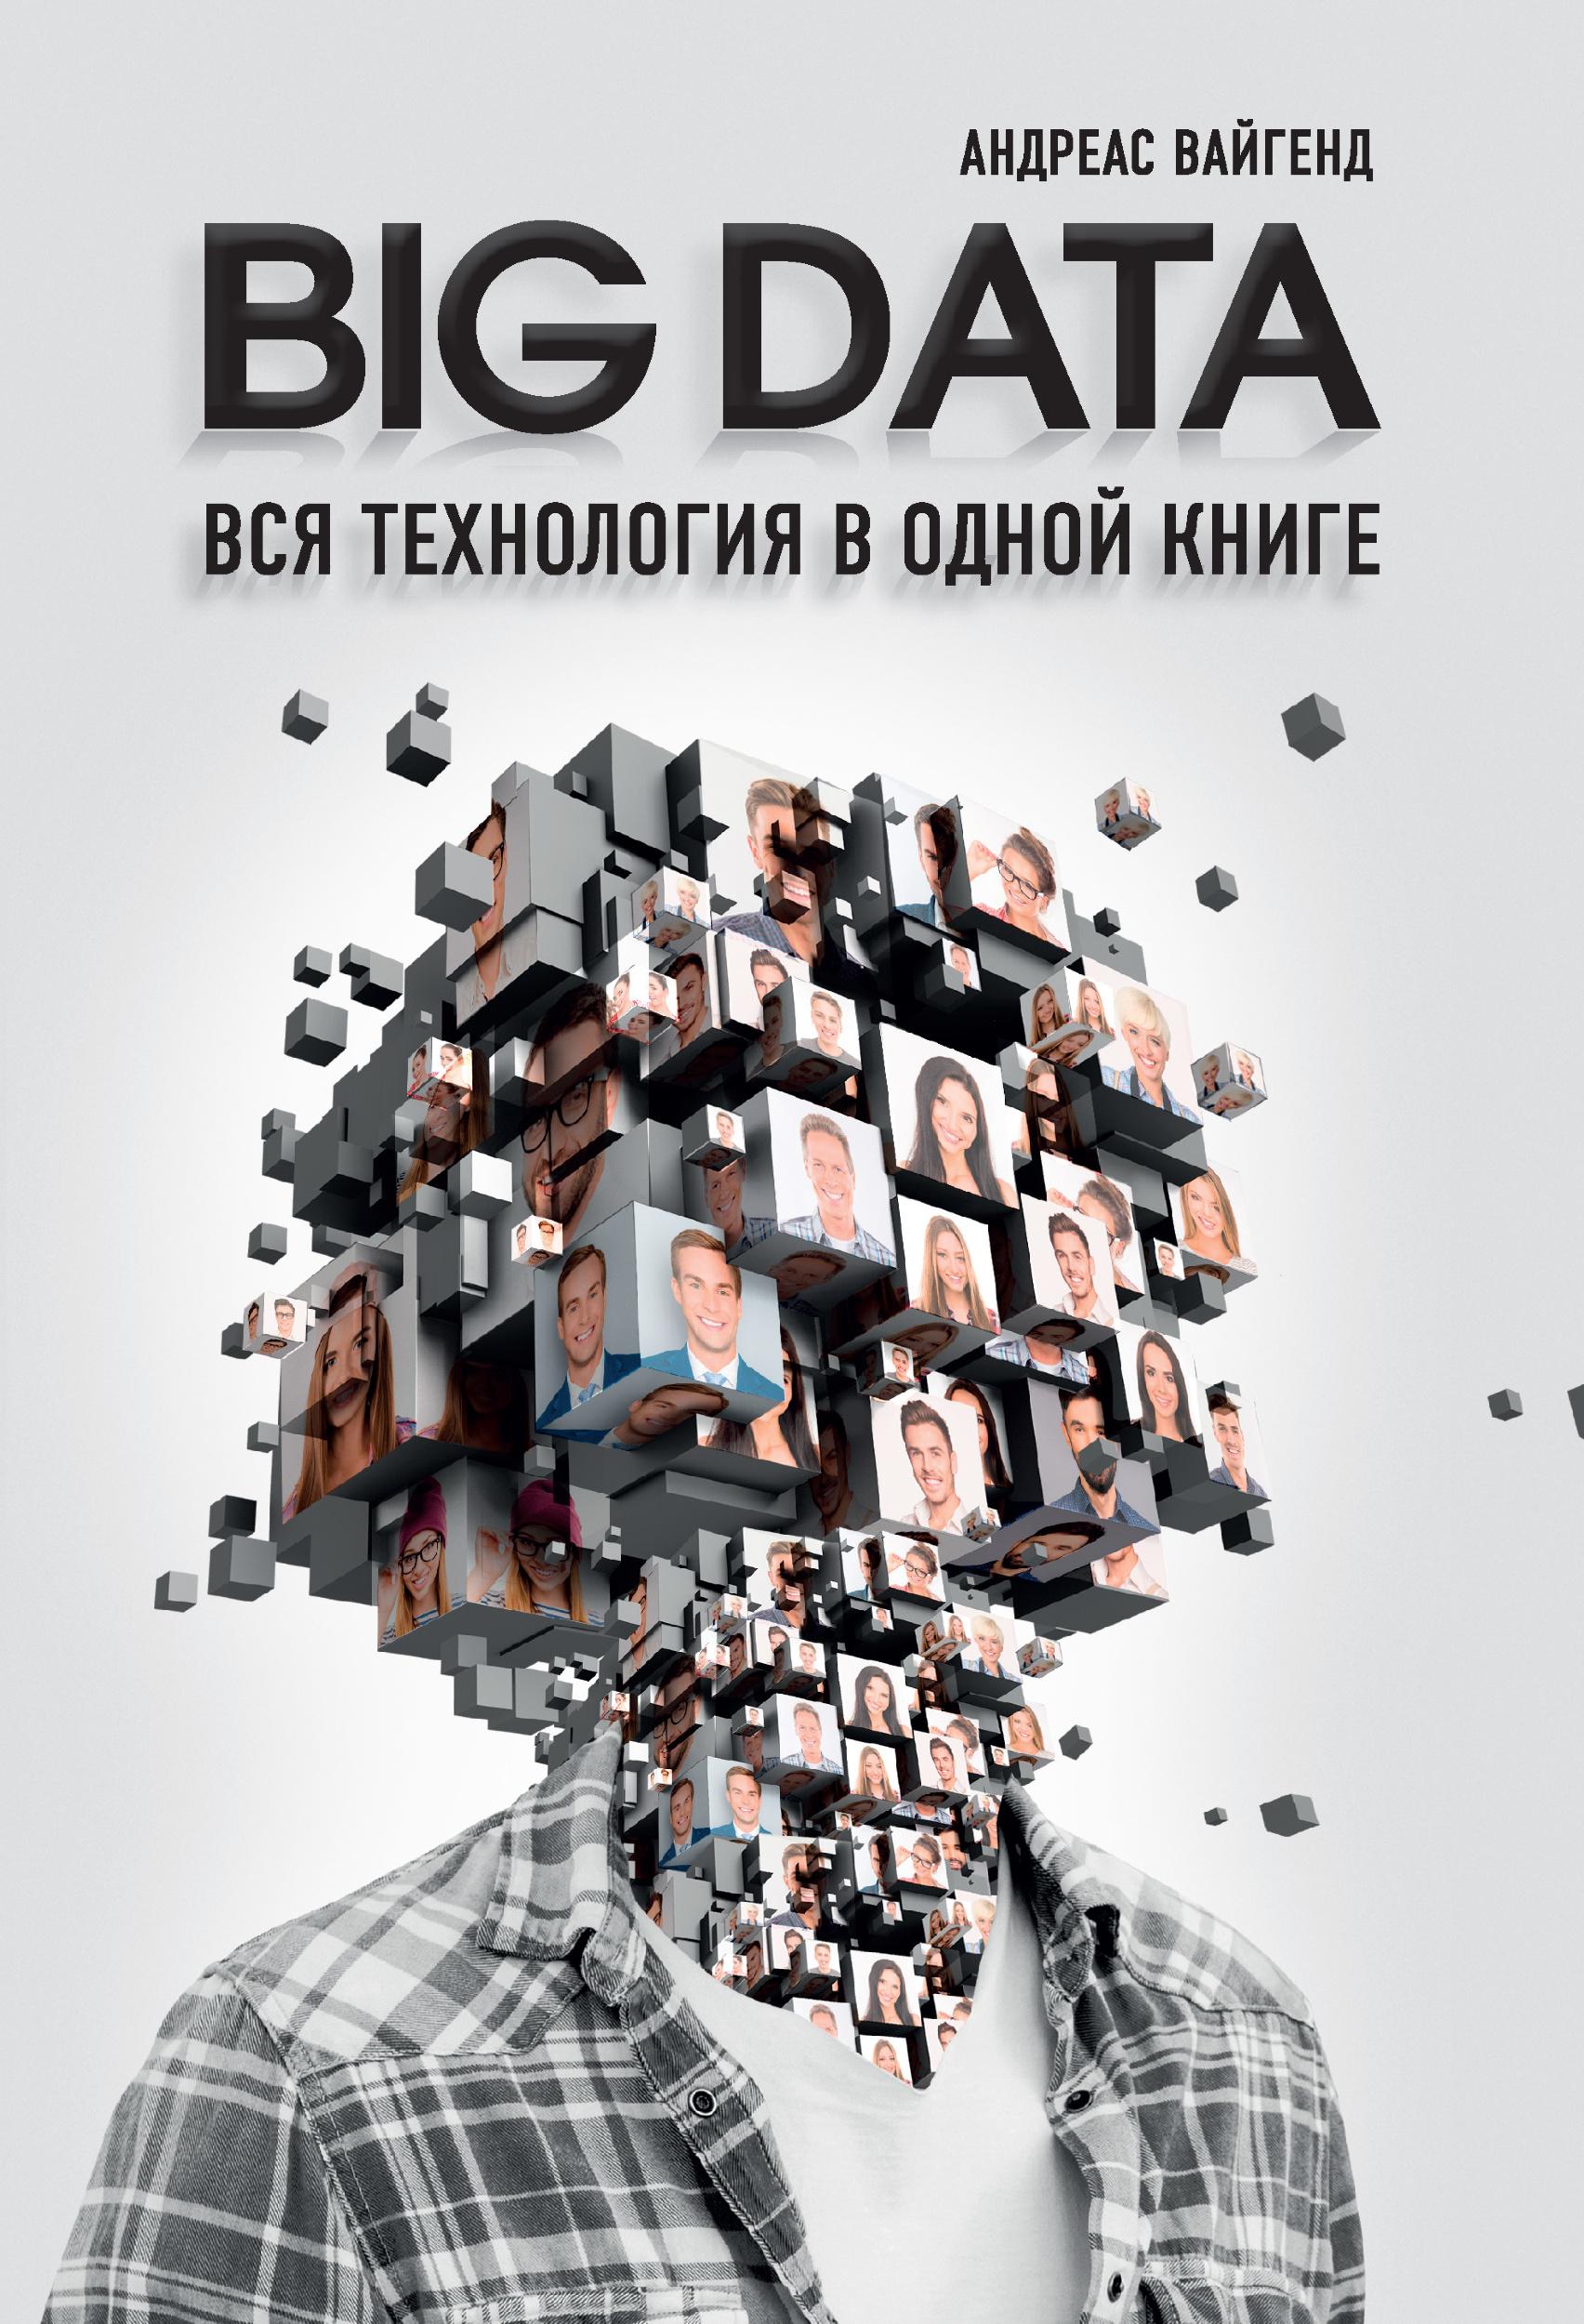 BIG DATA. Вся технология в одной книге. Автор — Андреас Вайгенд.